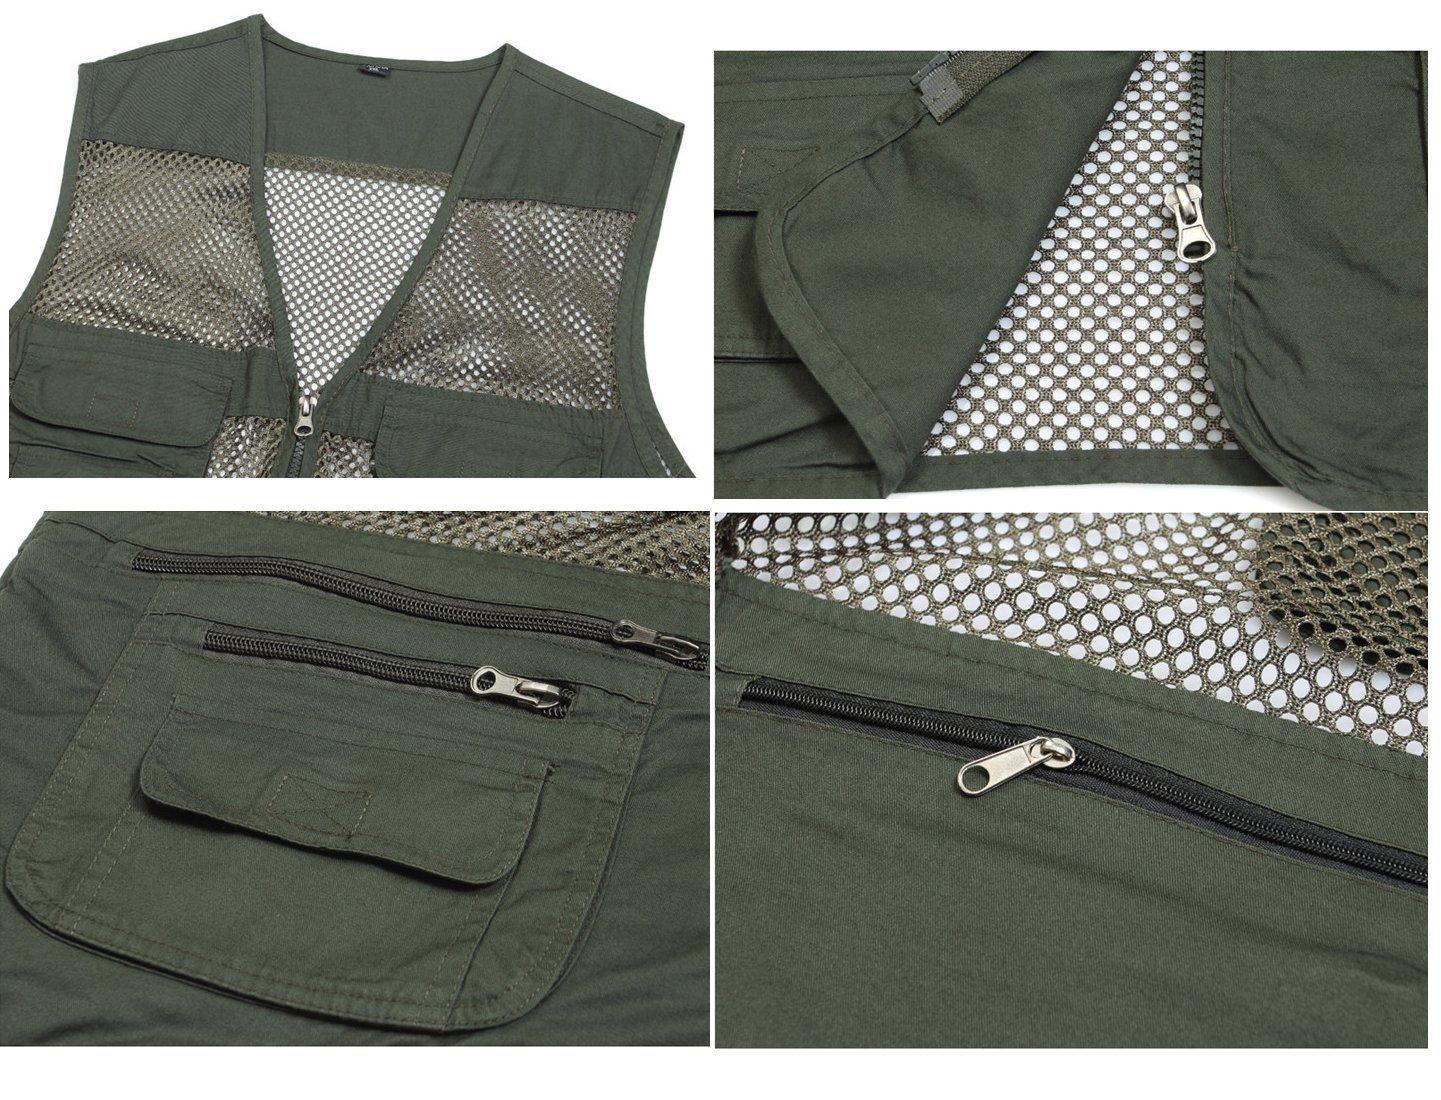 Mens Mesh Fishing Vest Photography Work Multi-Pockets Outdoors Journalists Vest Sleeveless Jacket